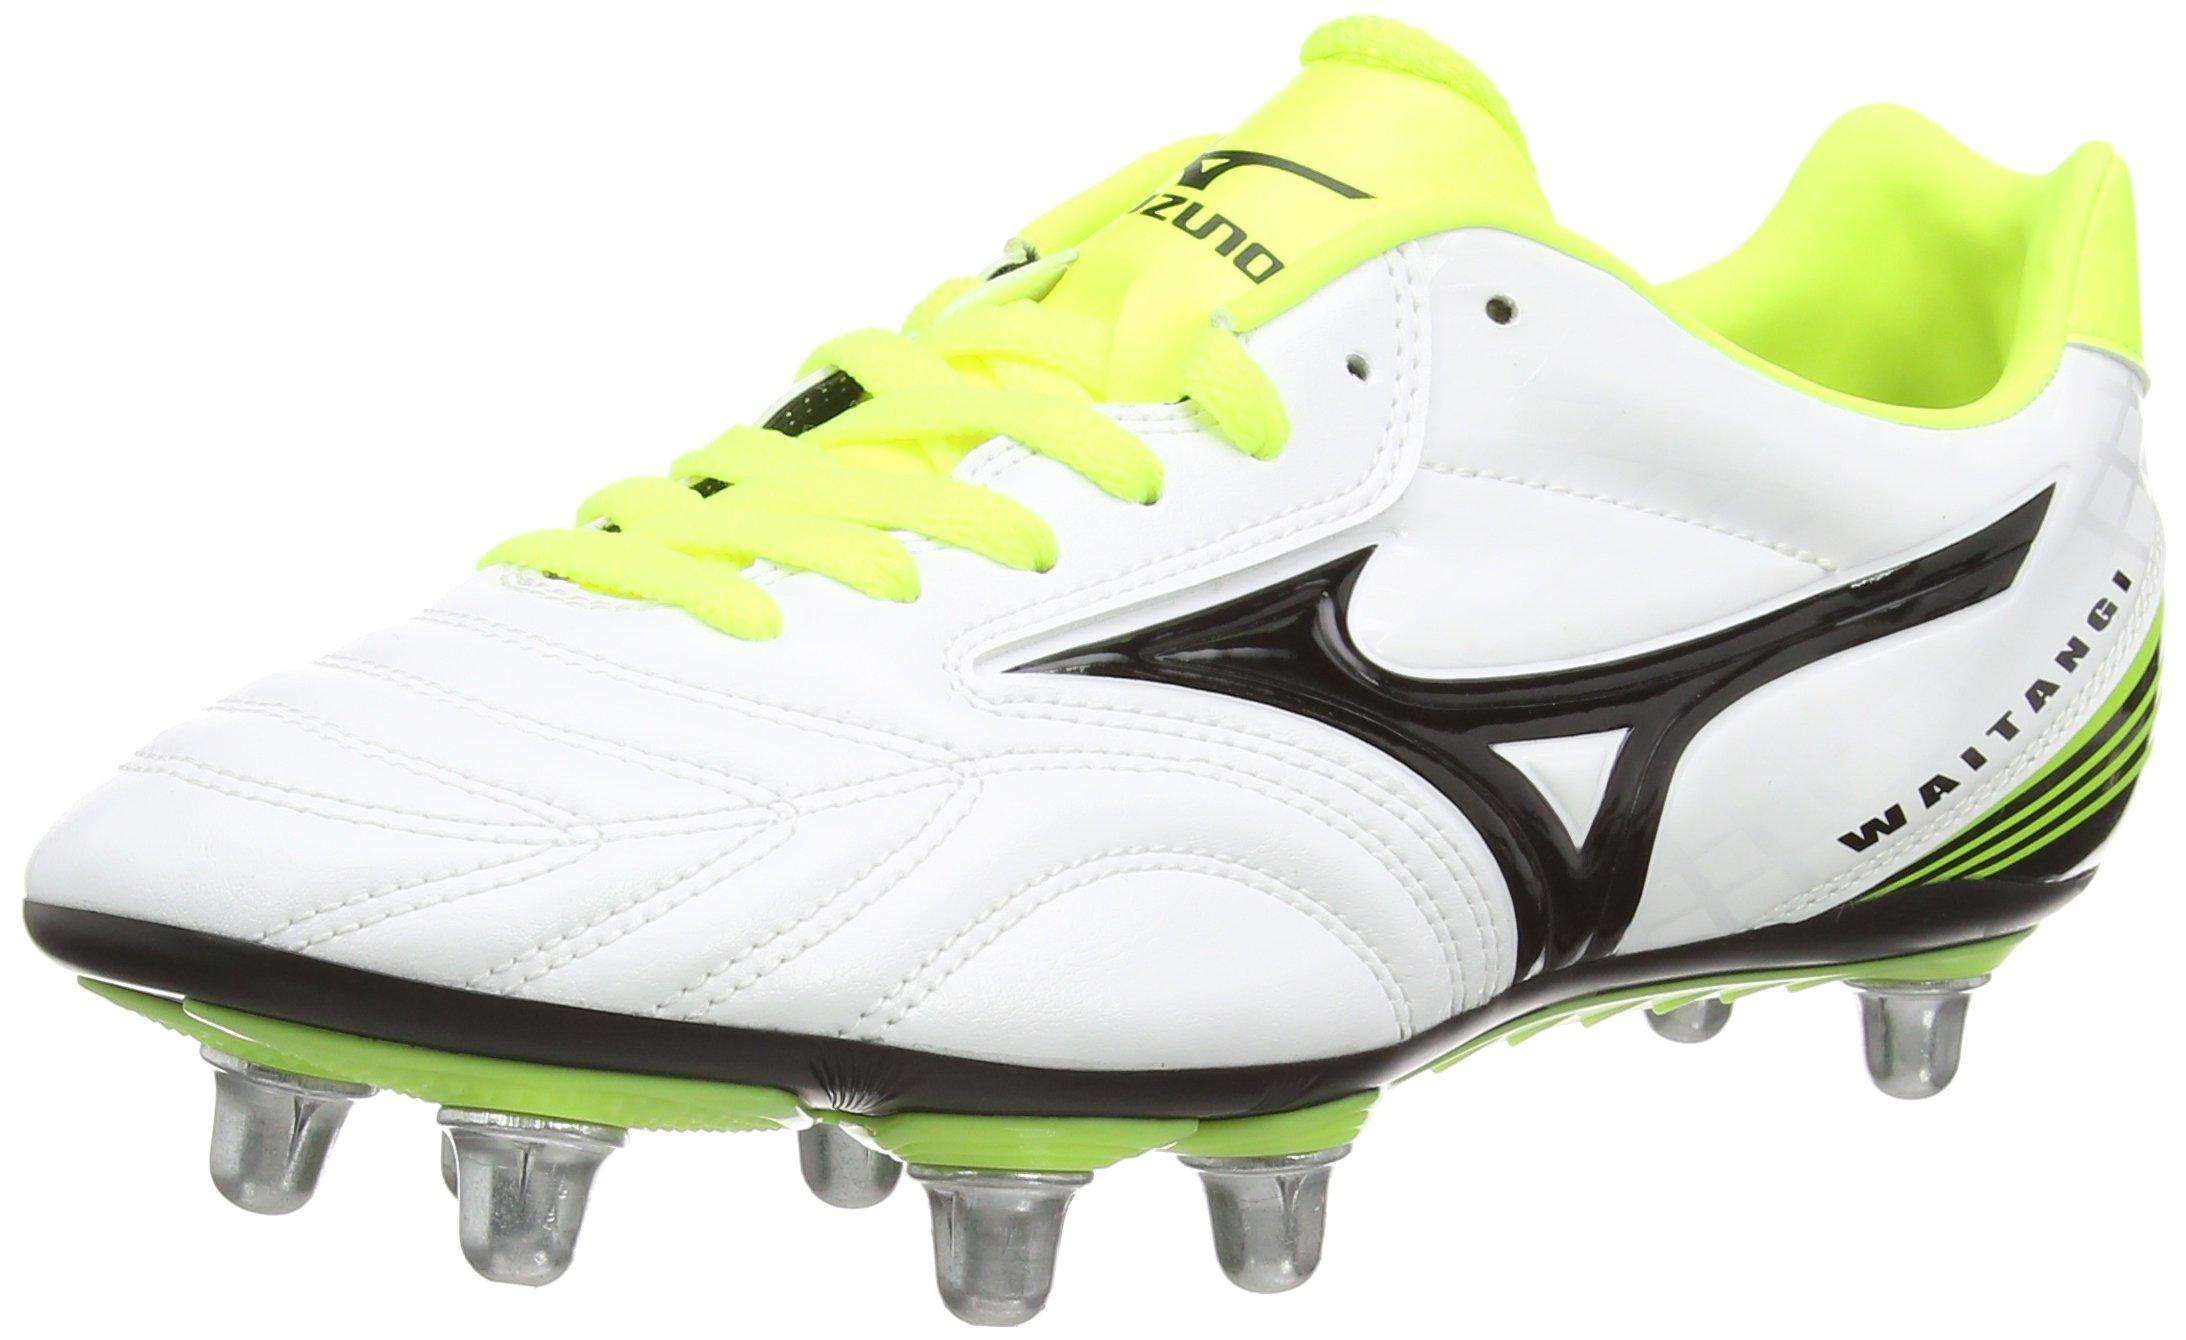 Mizuno AW15 WAITANGI PS PrimeSkin Rugby Boots - White/Yellow - UK 7